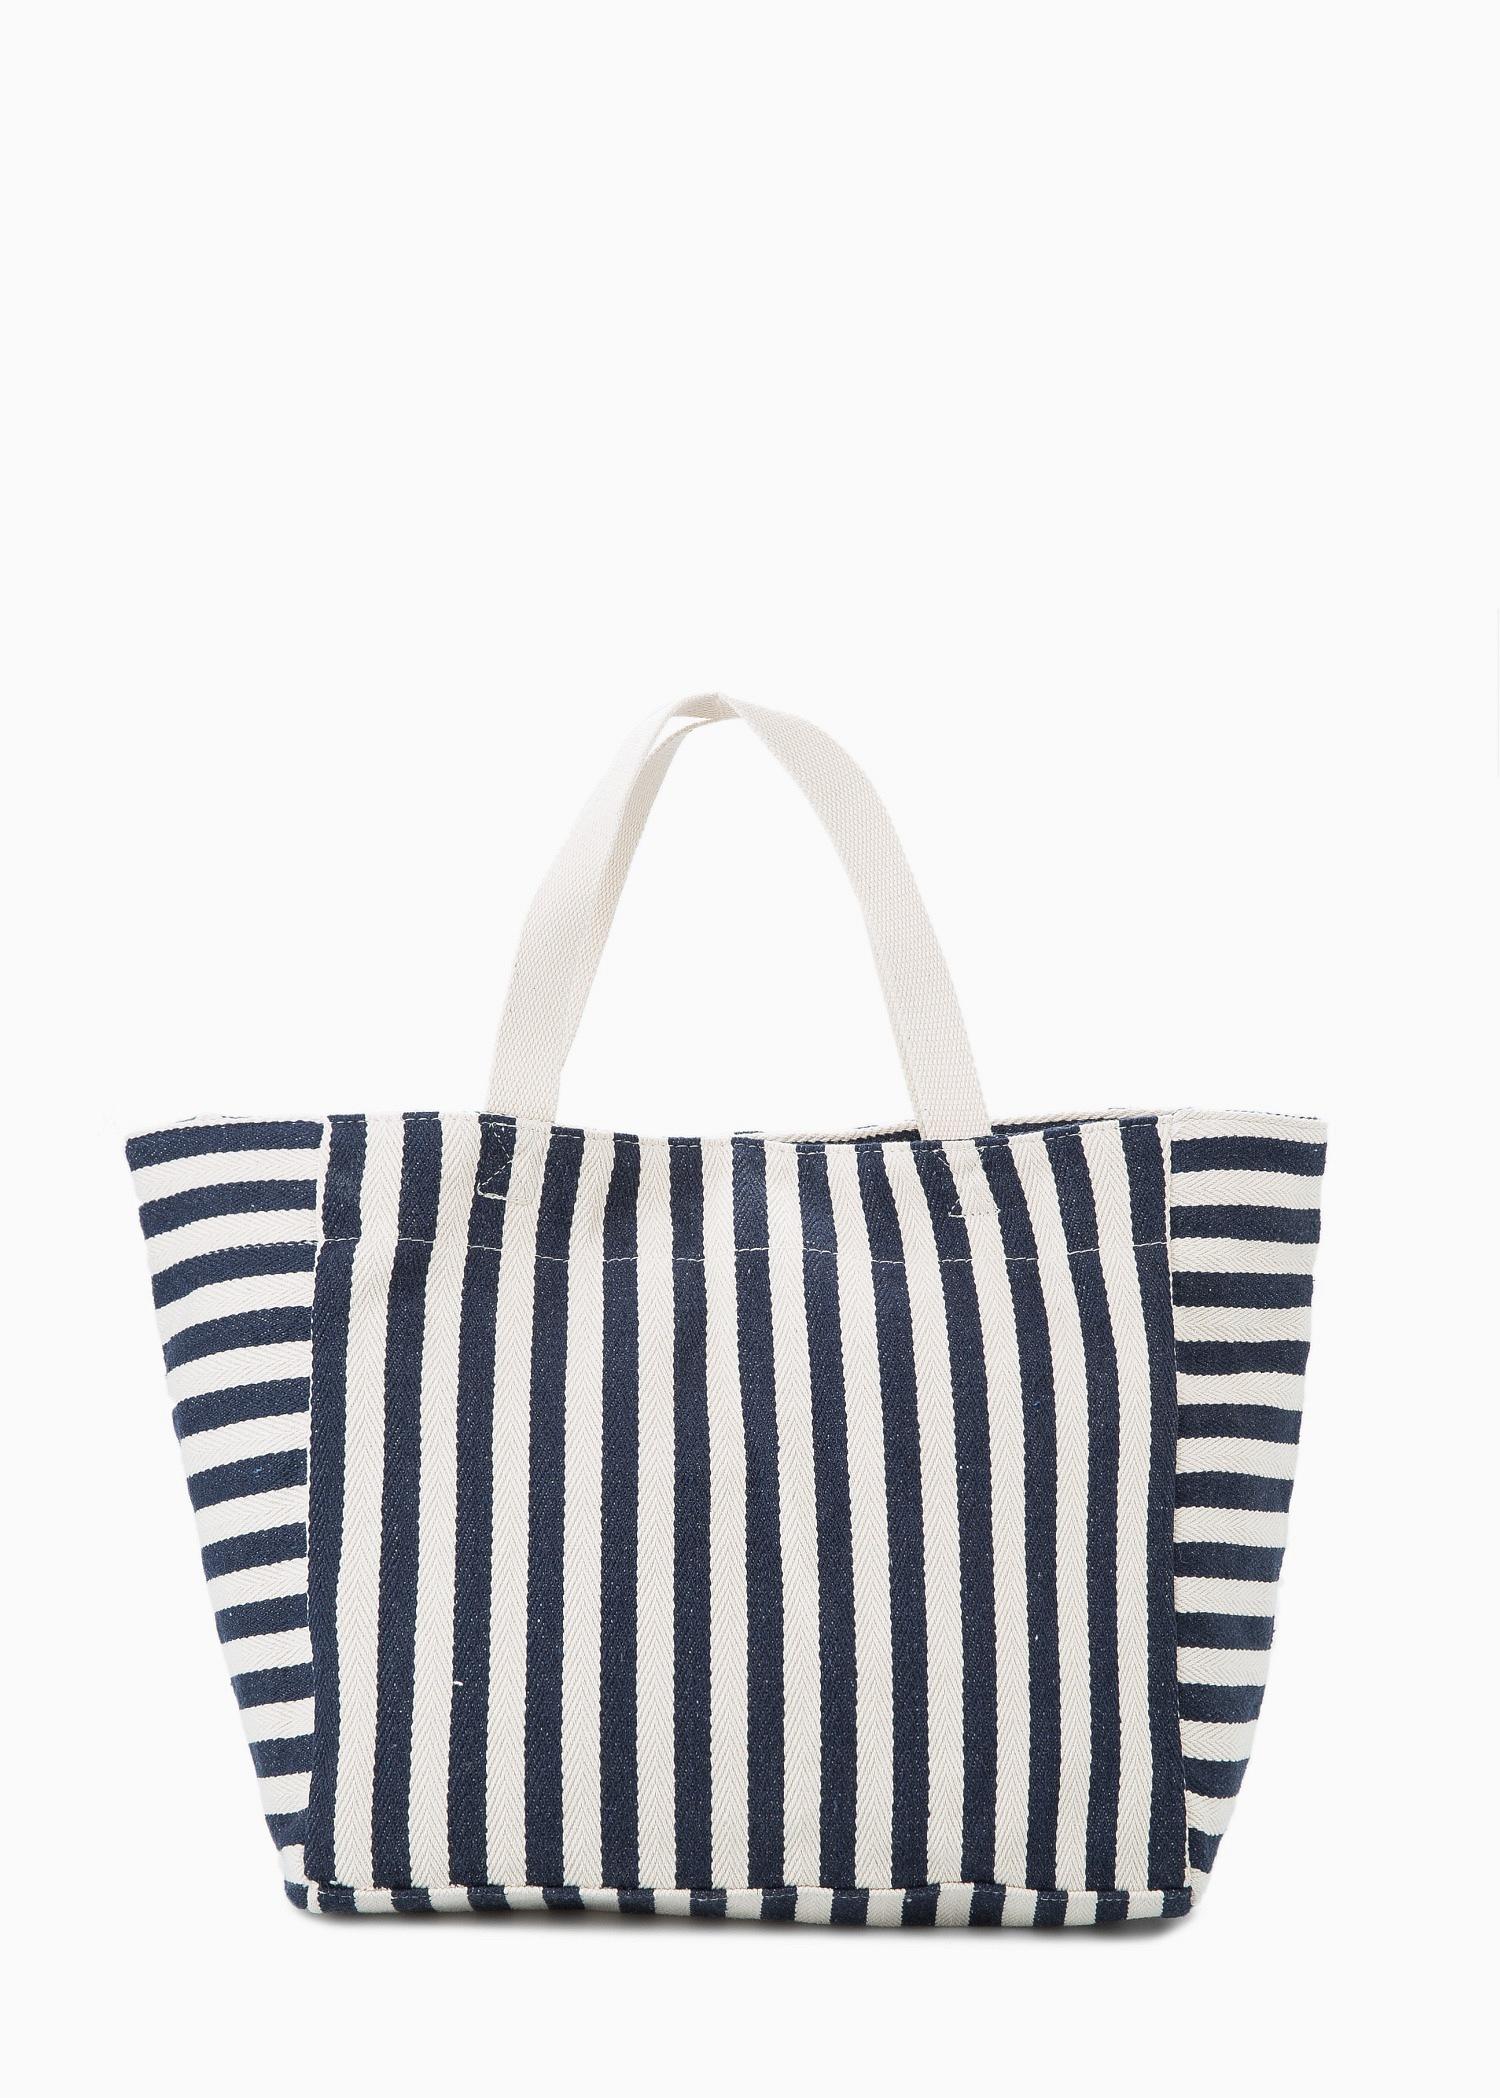 Mango Striped Cotton Shopper Bag in Blue | Lyst